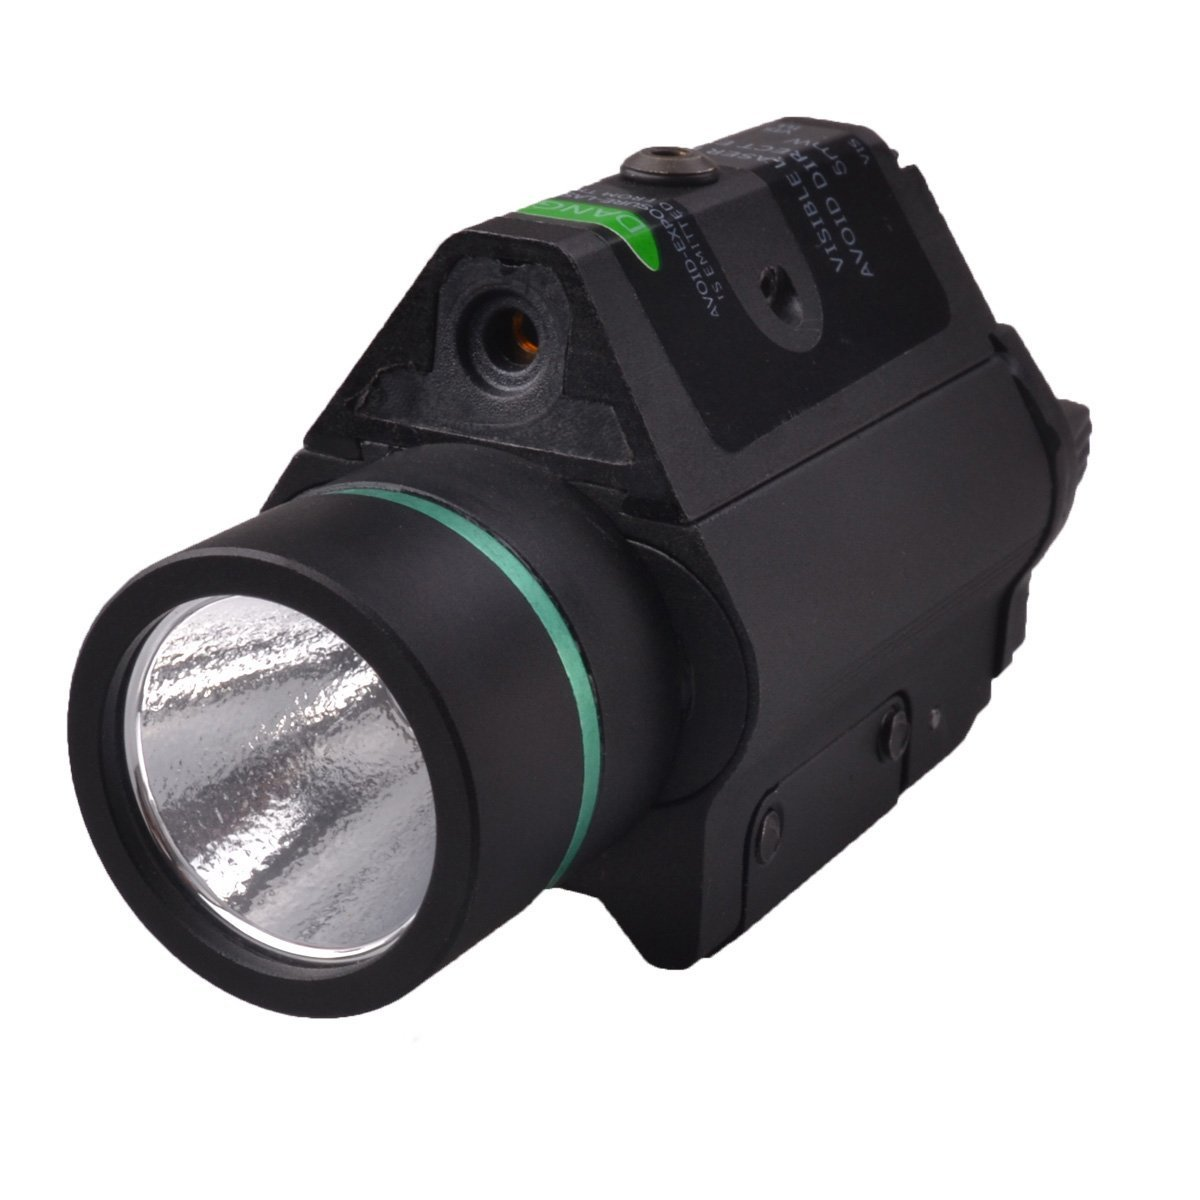 Freehawk® Rifle Laser/Gun Laser/Airsoft Laser/Gun Sights/Gun Lights, Tactical Compact Rail Mounted GREEN Laser Sight with 100 Lumen LED Flashlight